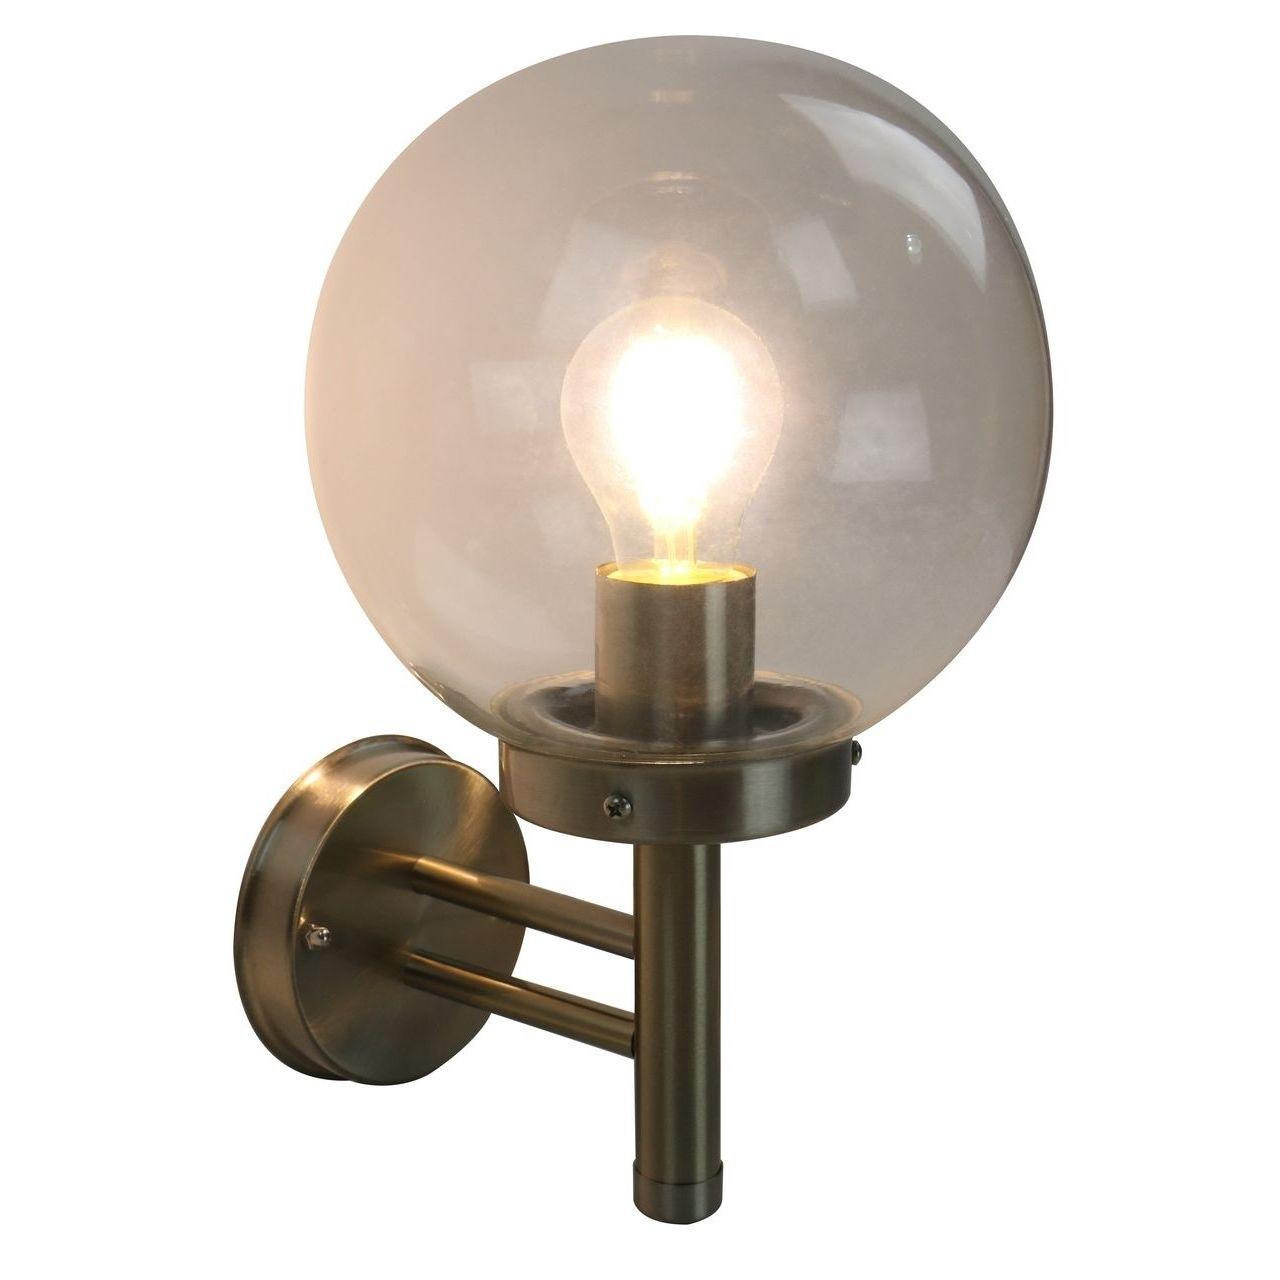 A8365AL-1SS Уличный настенный светильник Arte Lamp Gazebo